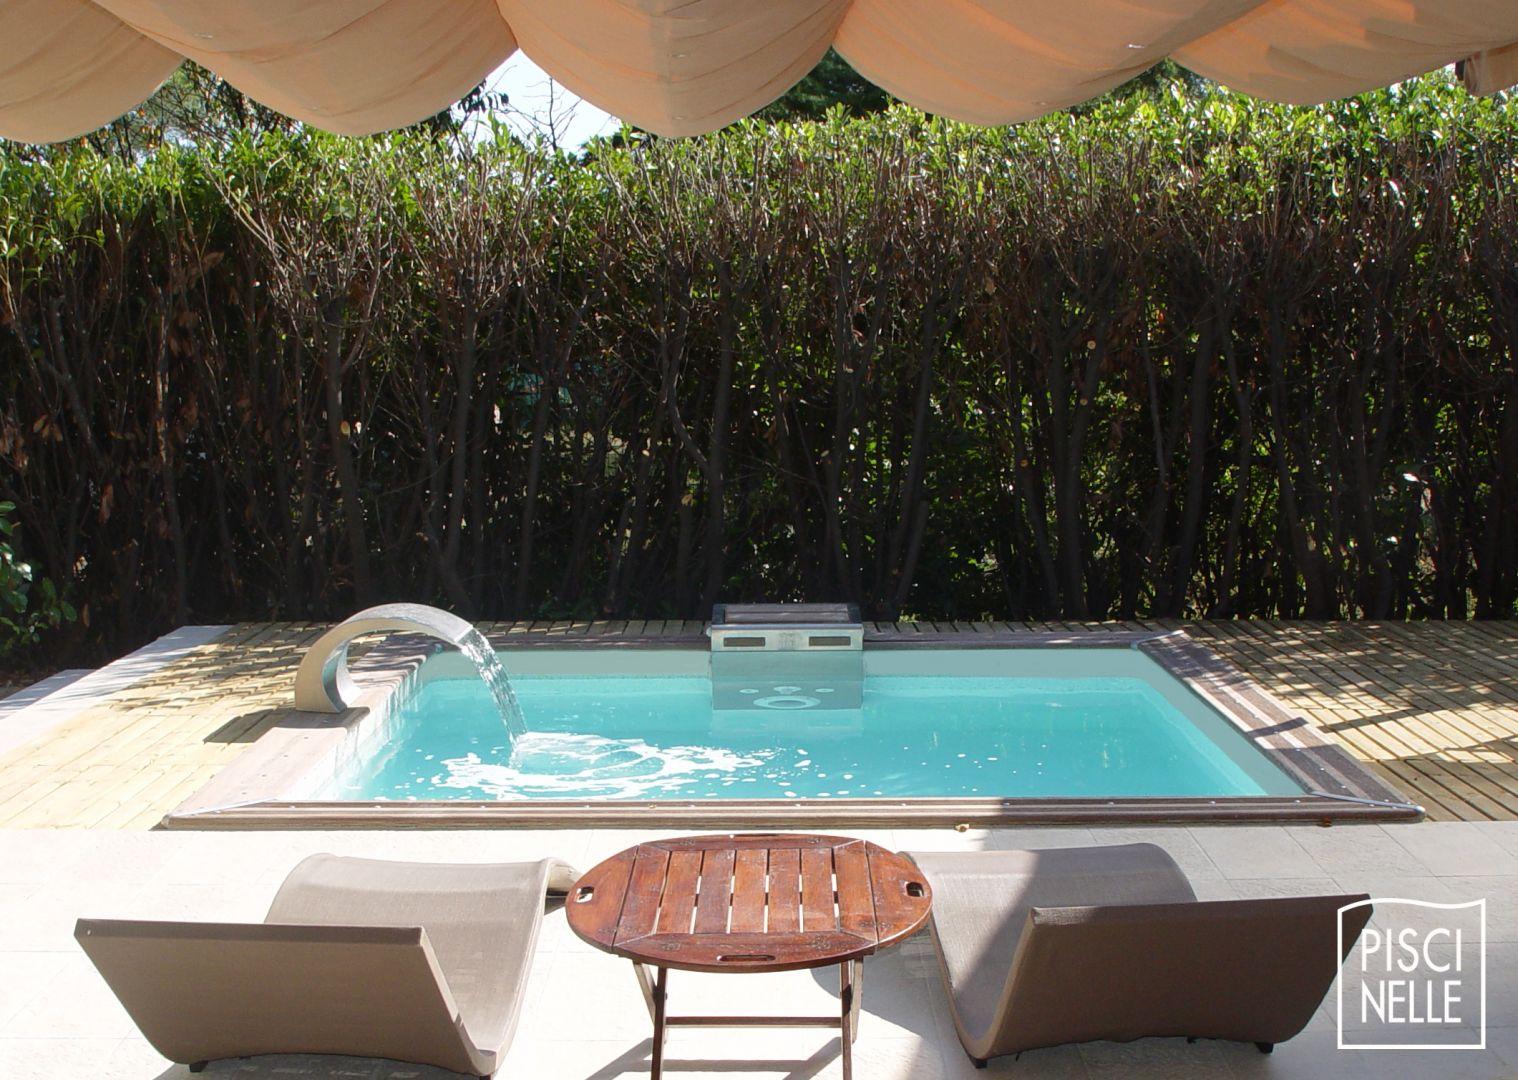 Piscine de petite taille piscine xs mini piscine piscinelle for Prix petite piscine